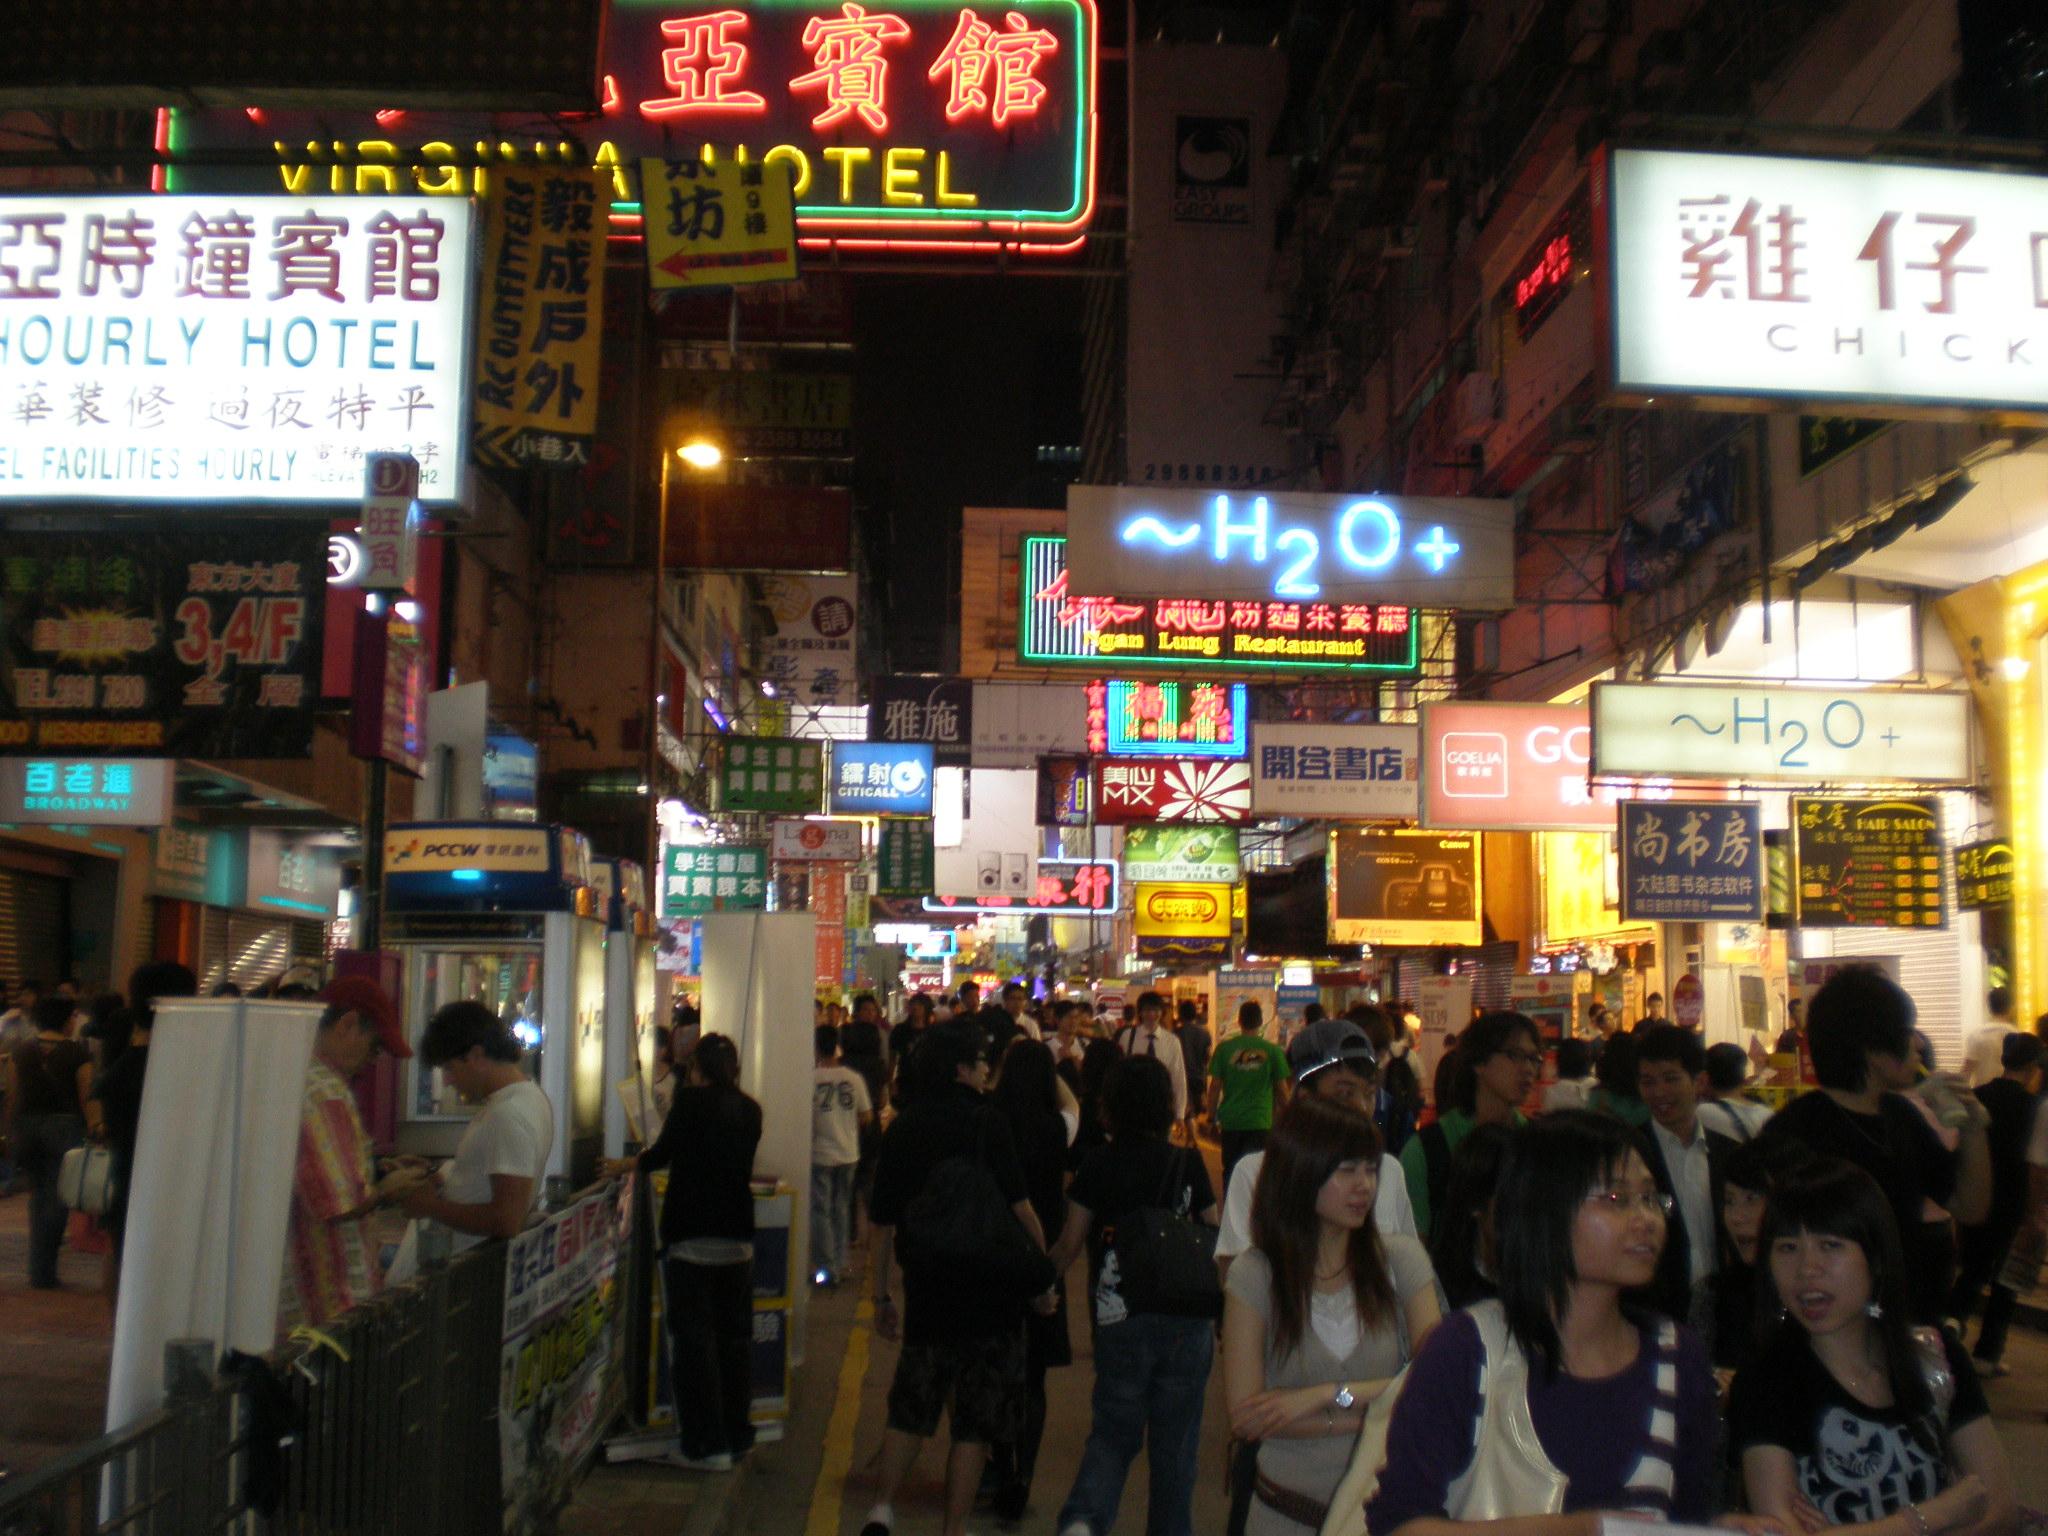 7 Hong Kong Street Names That Make No Sense File Outdoor Wiring Jpg Wikimedia Commons